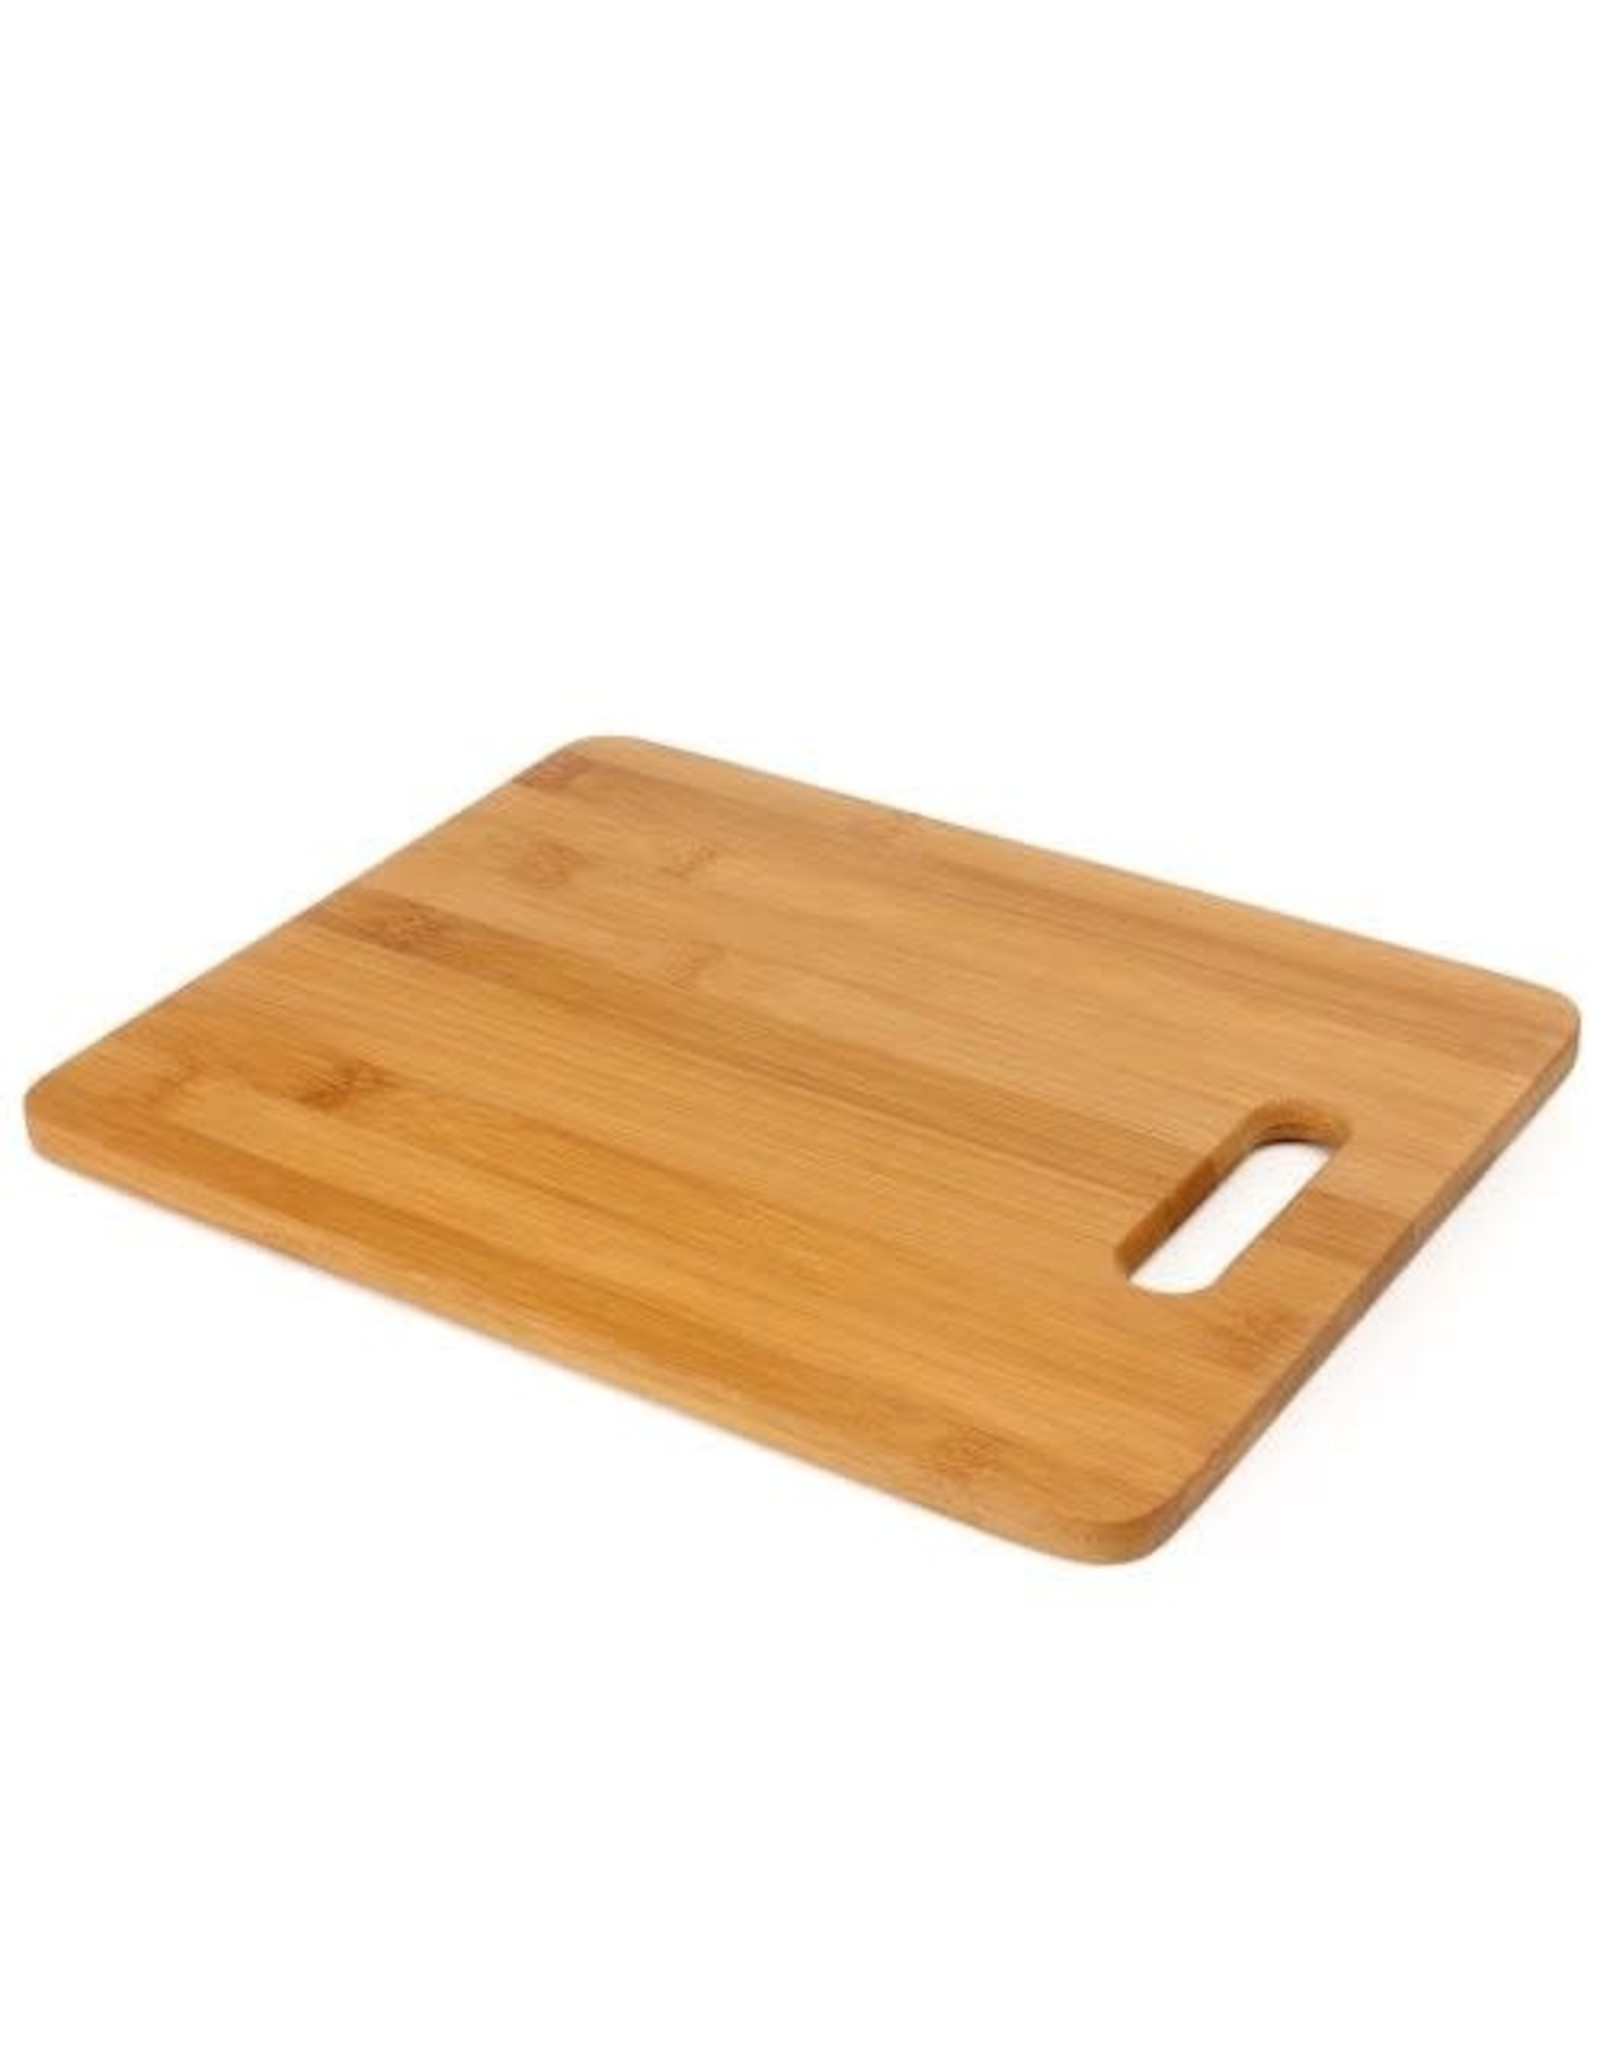 "Bamboo Cutting Board 12x9"""